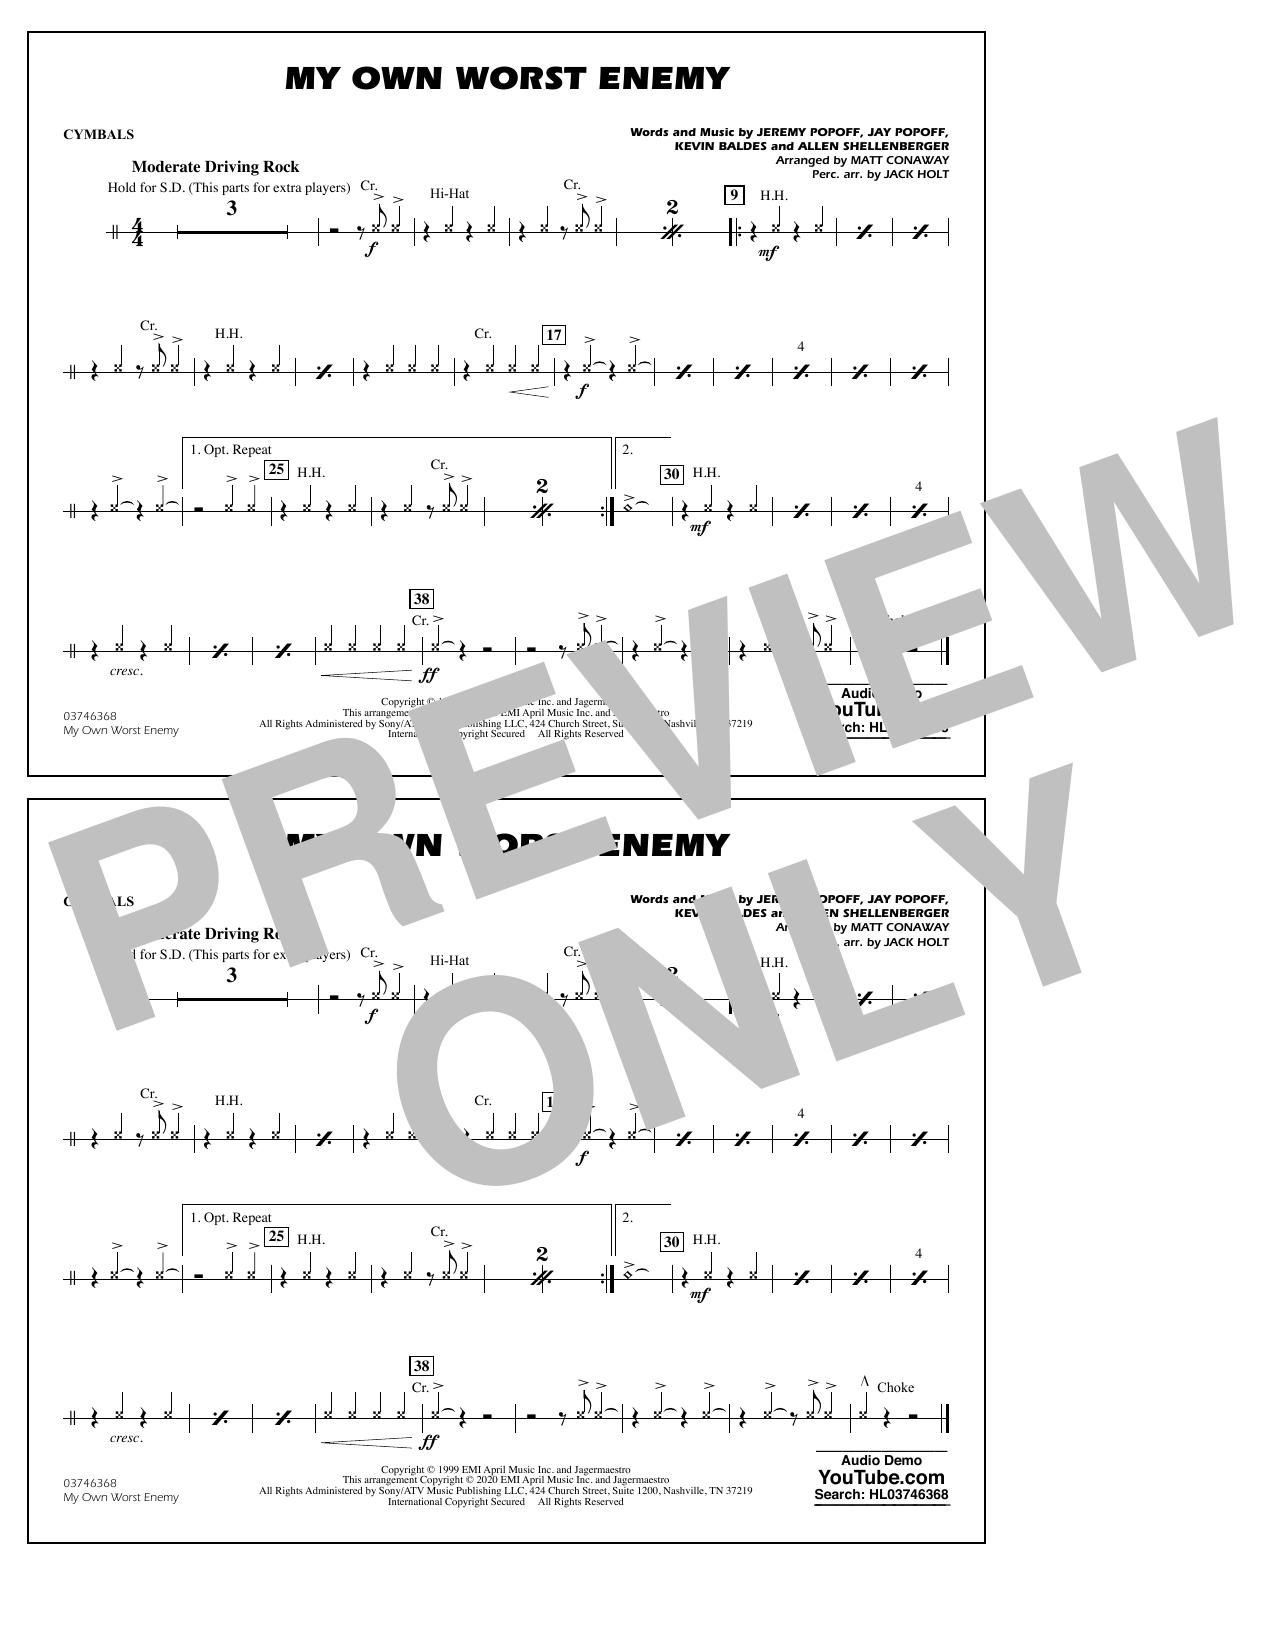 My Own Worst Enemy (arr. Matt Conaway) - Cymbals Sheet Music